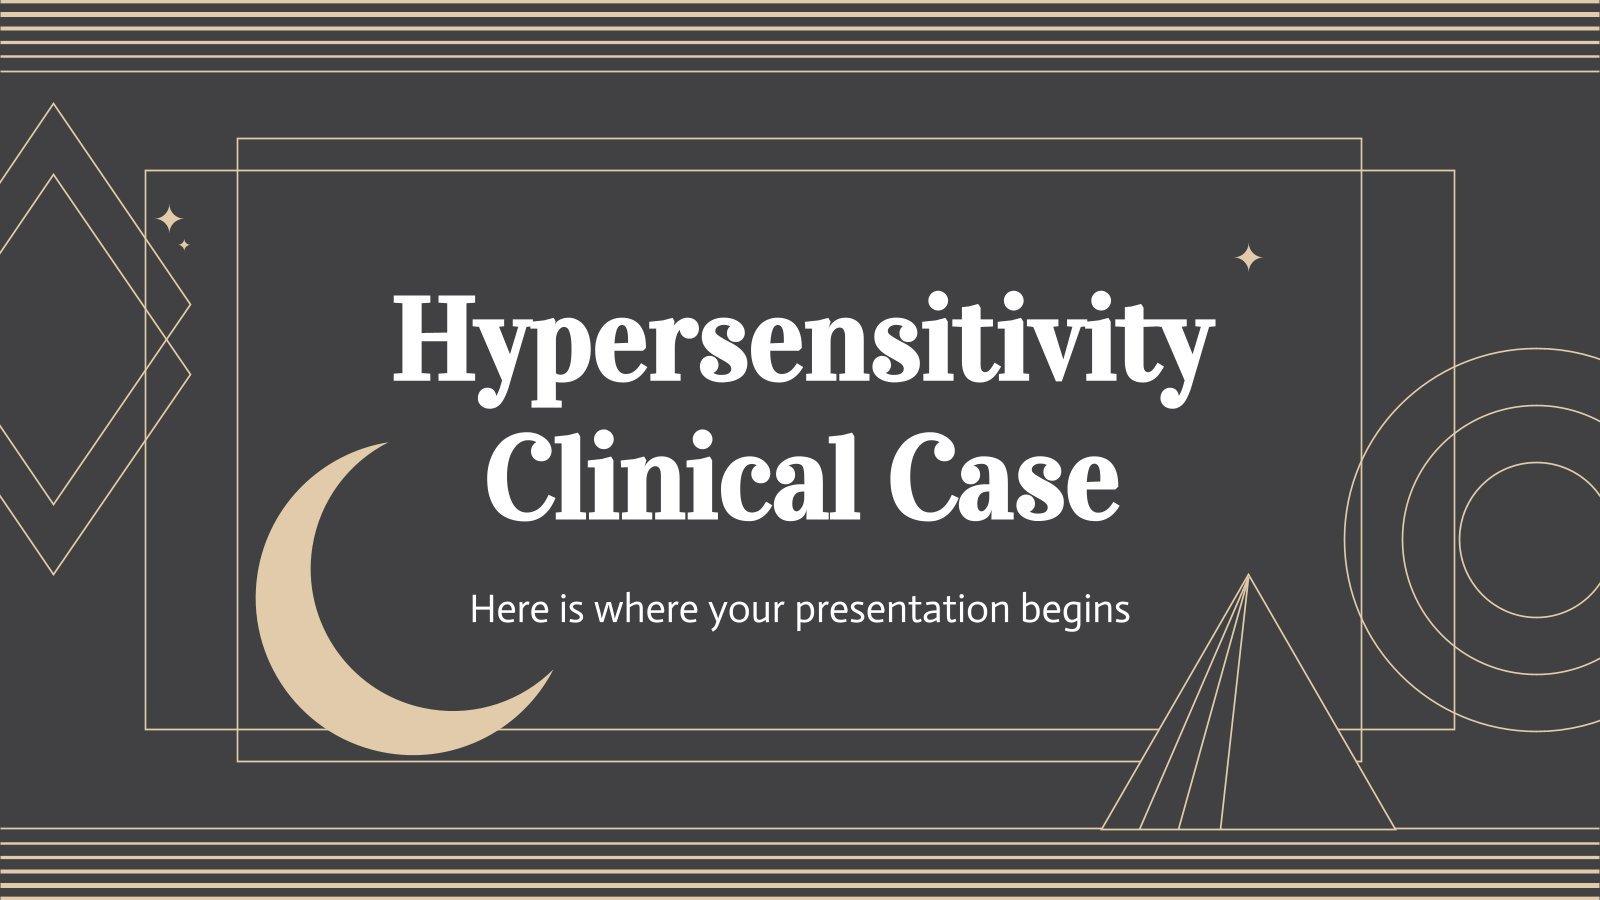 Hypersensitivity Clinical Case presentation template